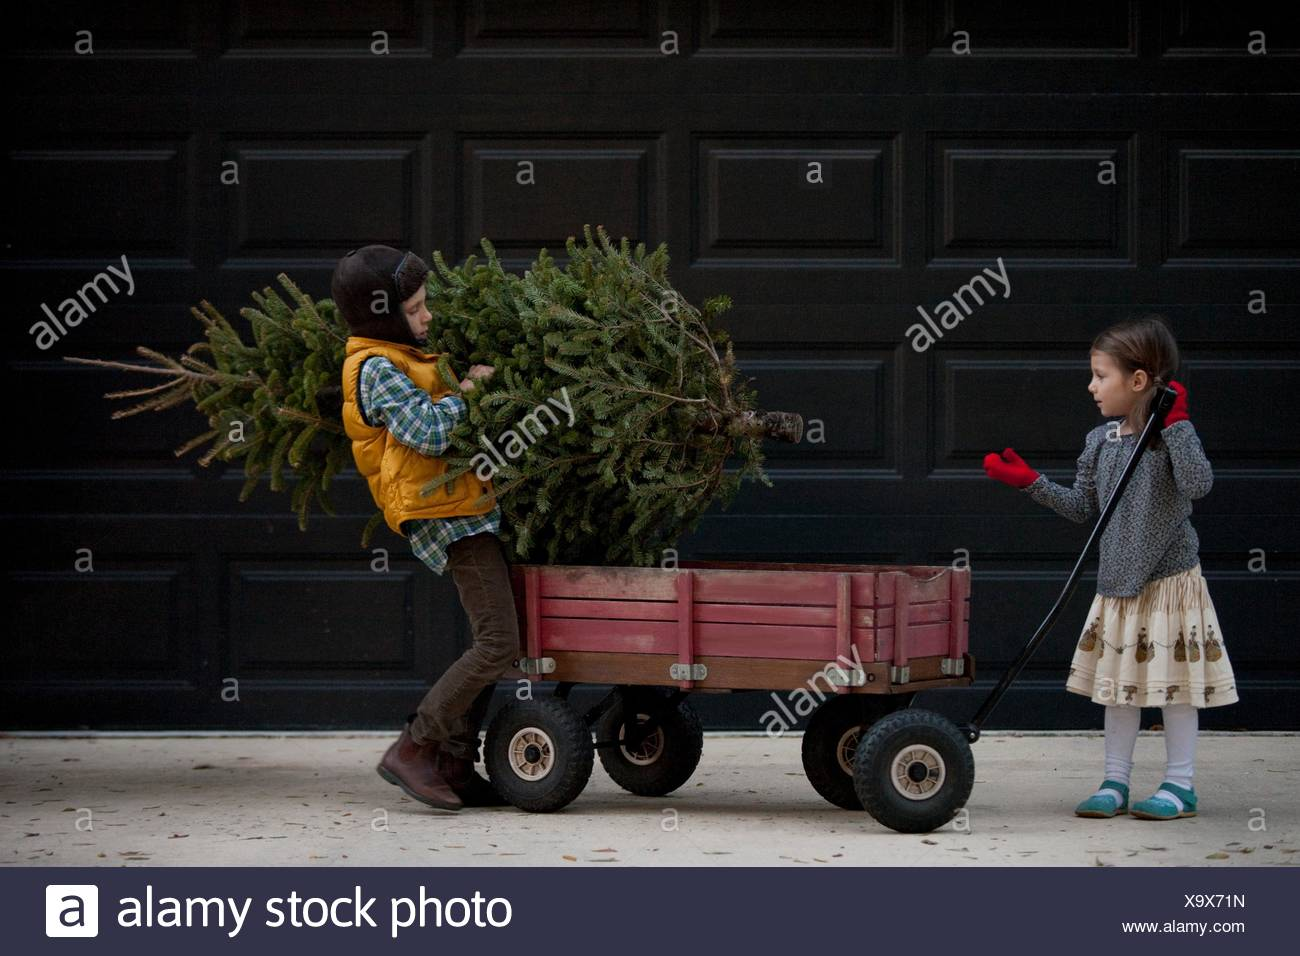 Girl and boy loading cart with christmas tree - Stock Image